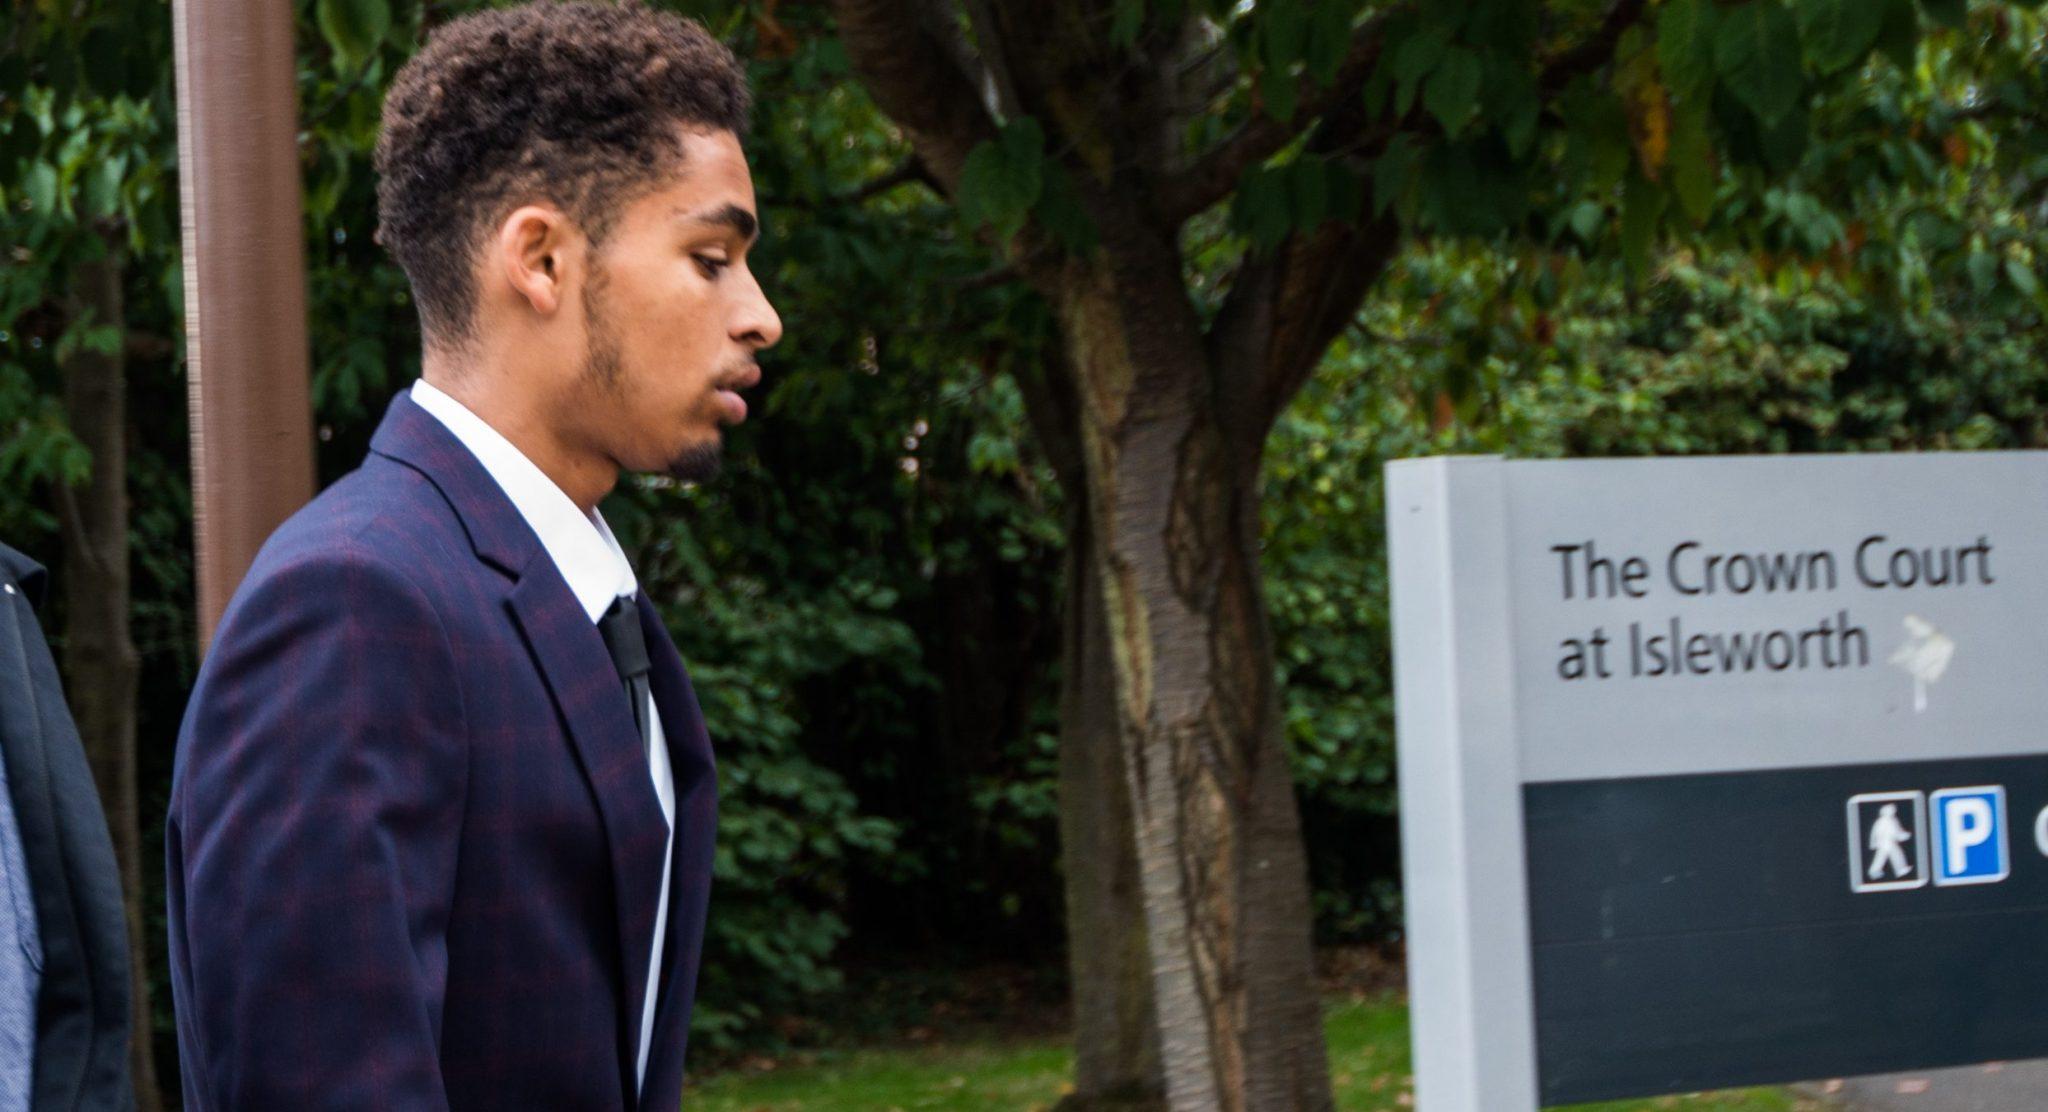 Ex Charlton player faces jail for WhatsApp rape